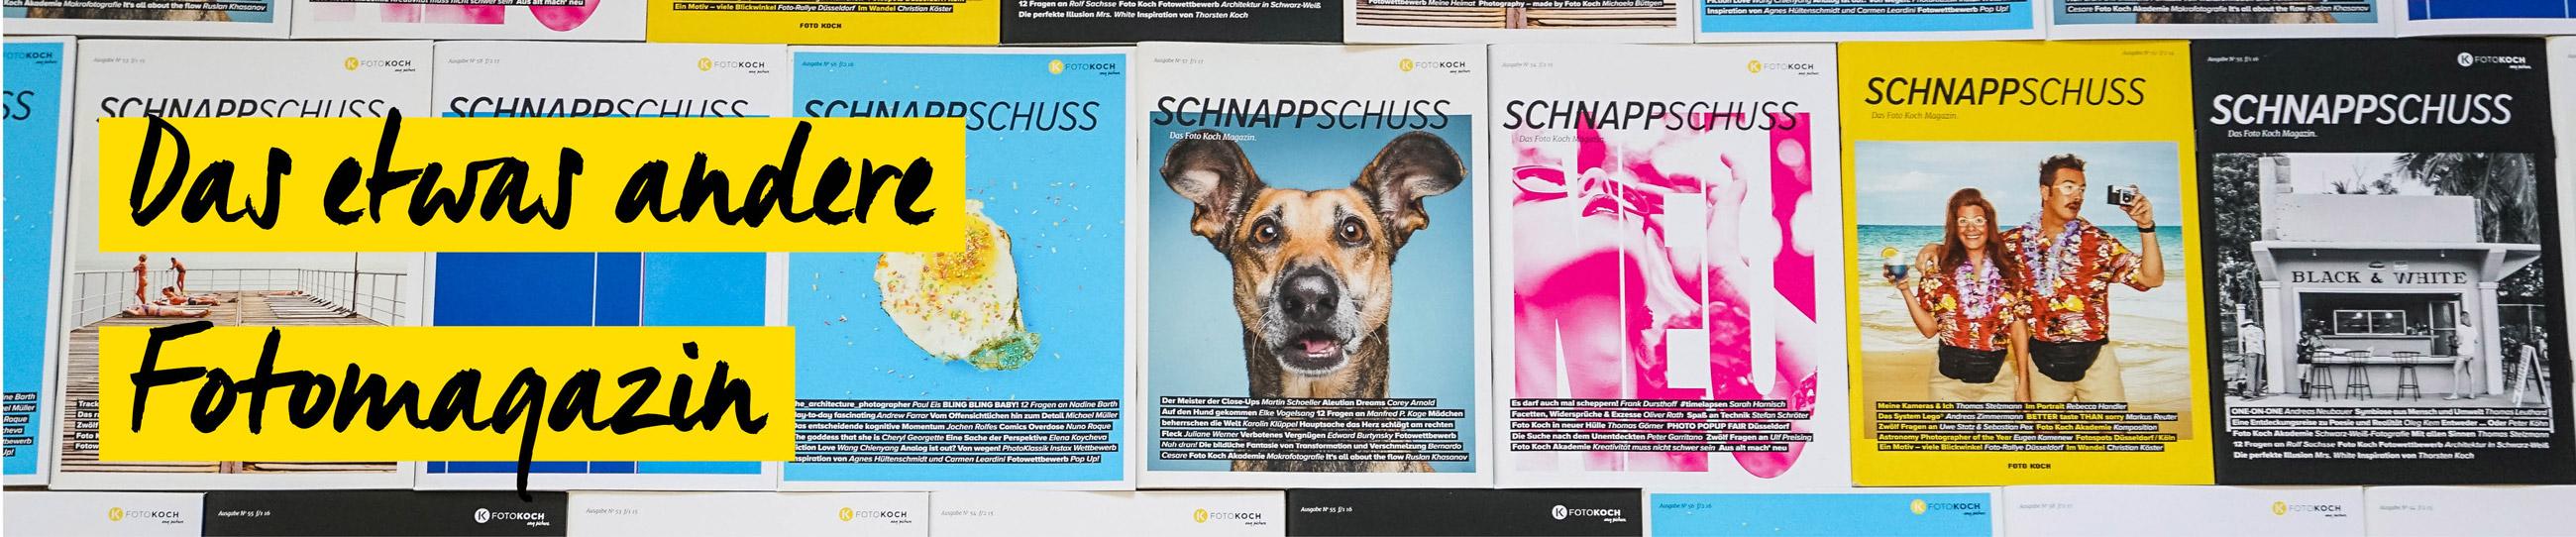 Schnappschuss Magazin